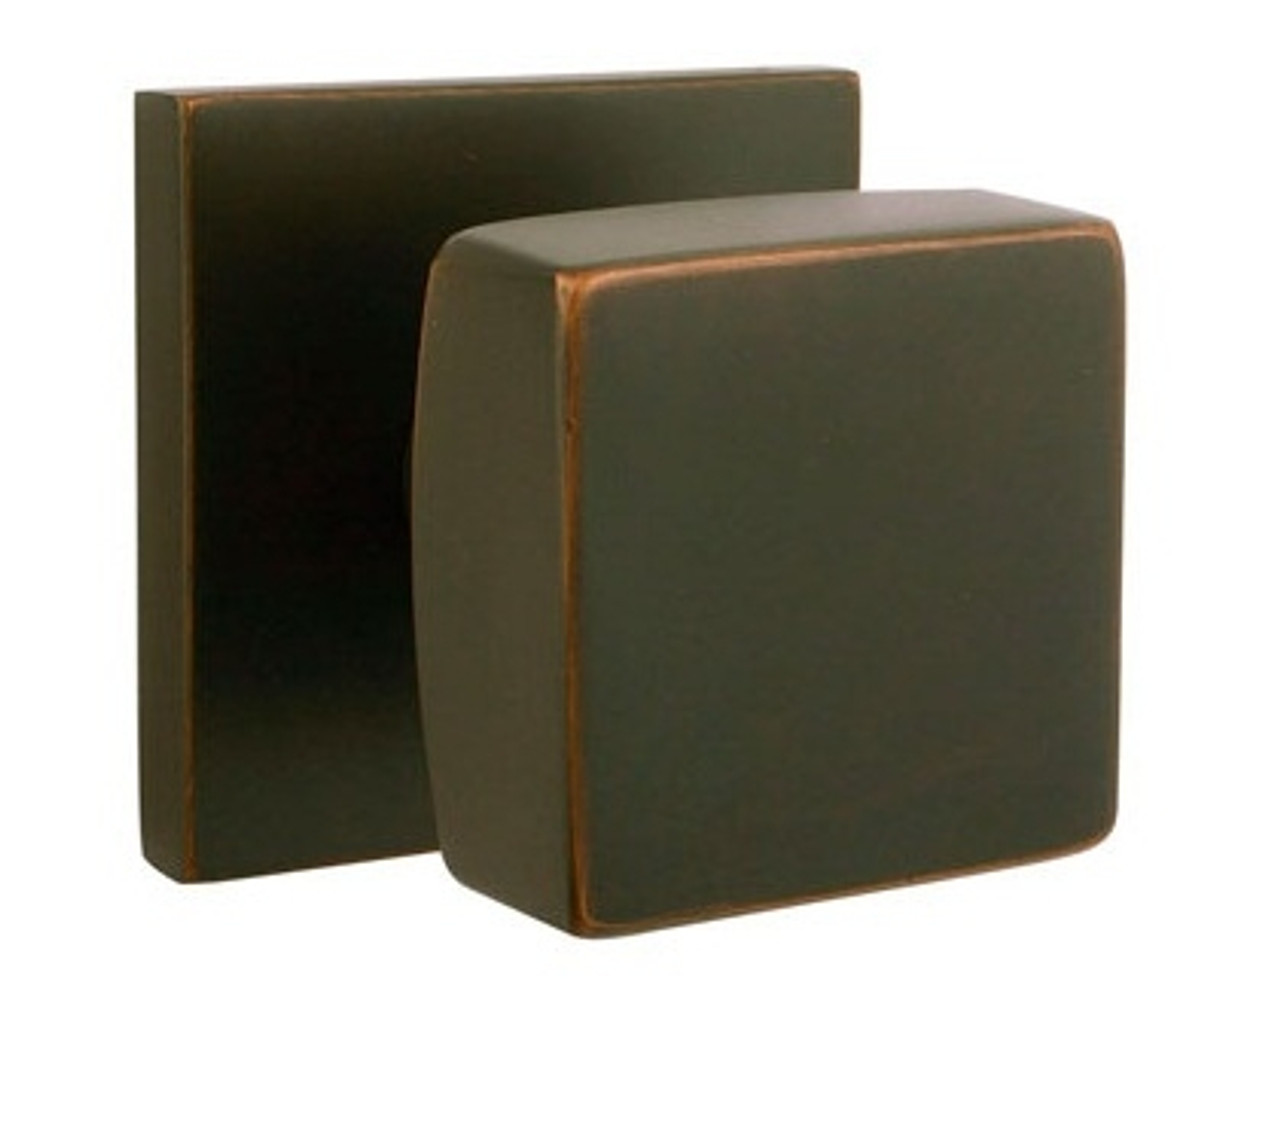 Square Brass Modern Door Knob by Emtek